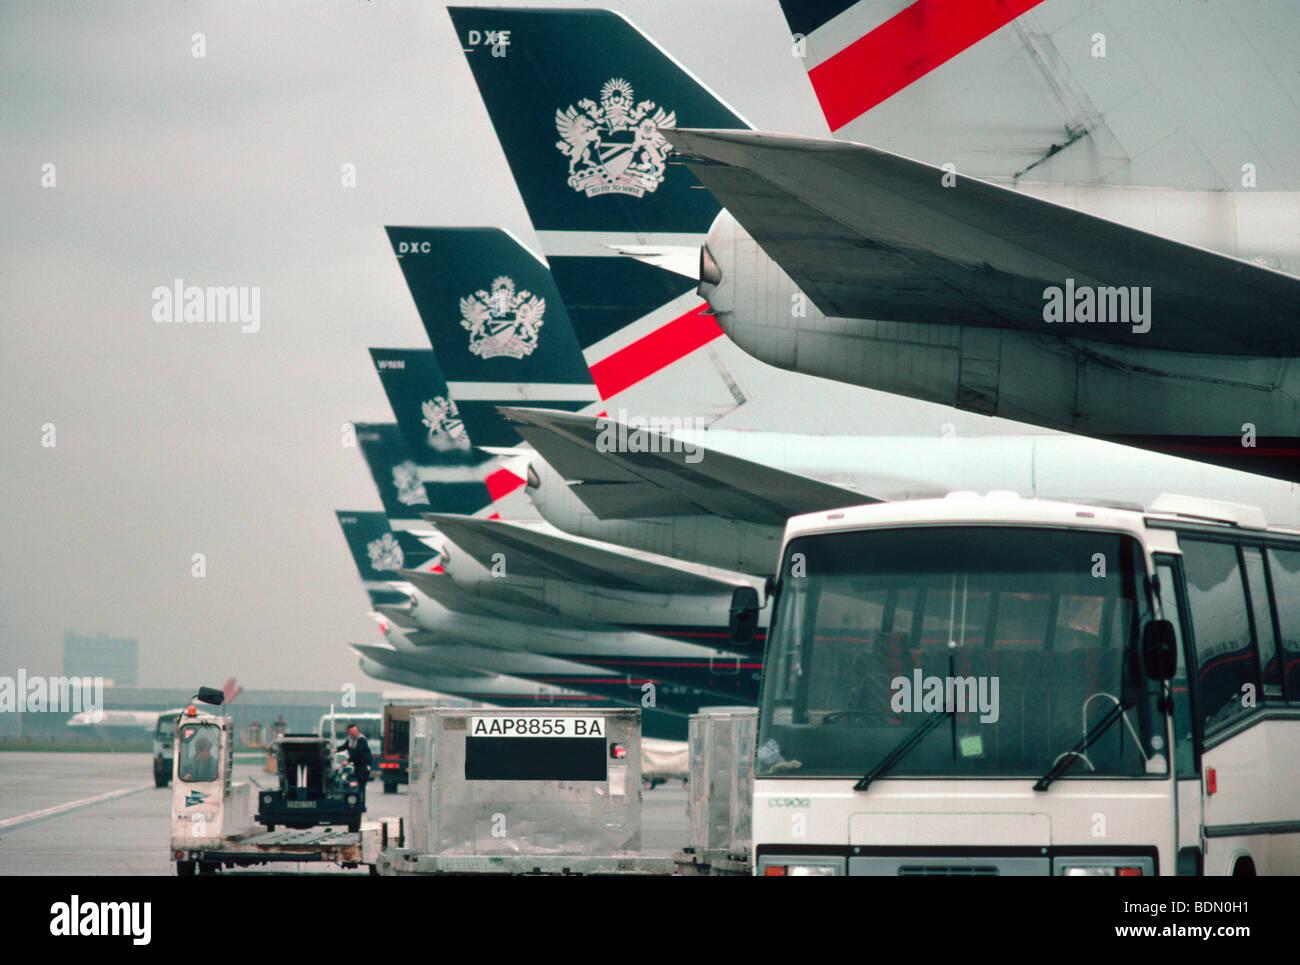 Heathrow International Airport, - Stock Image